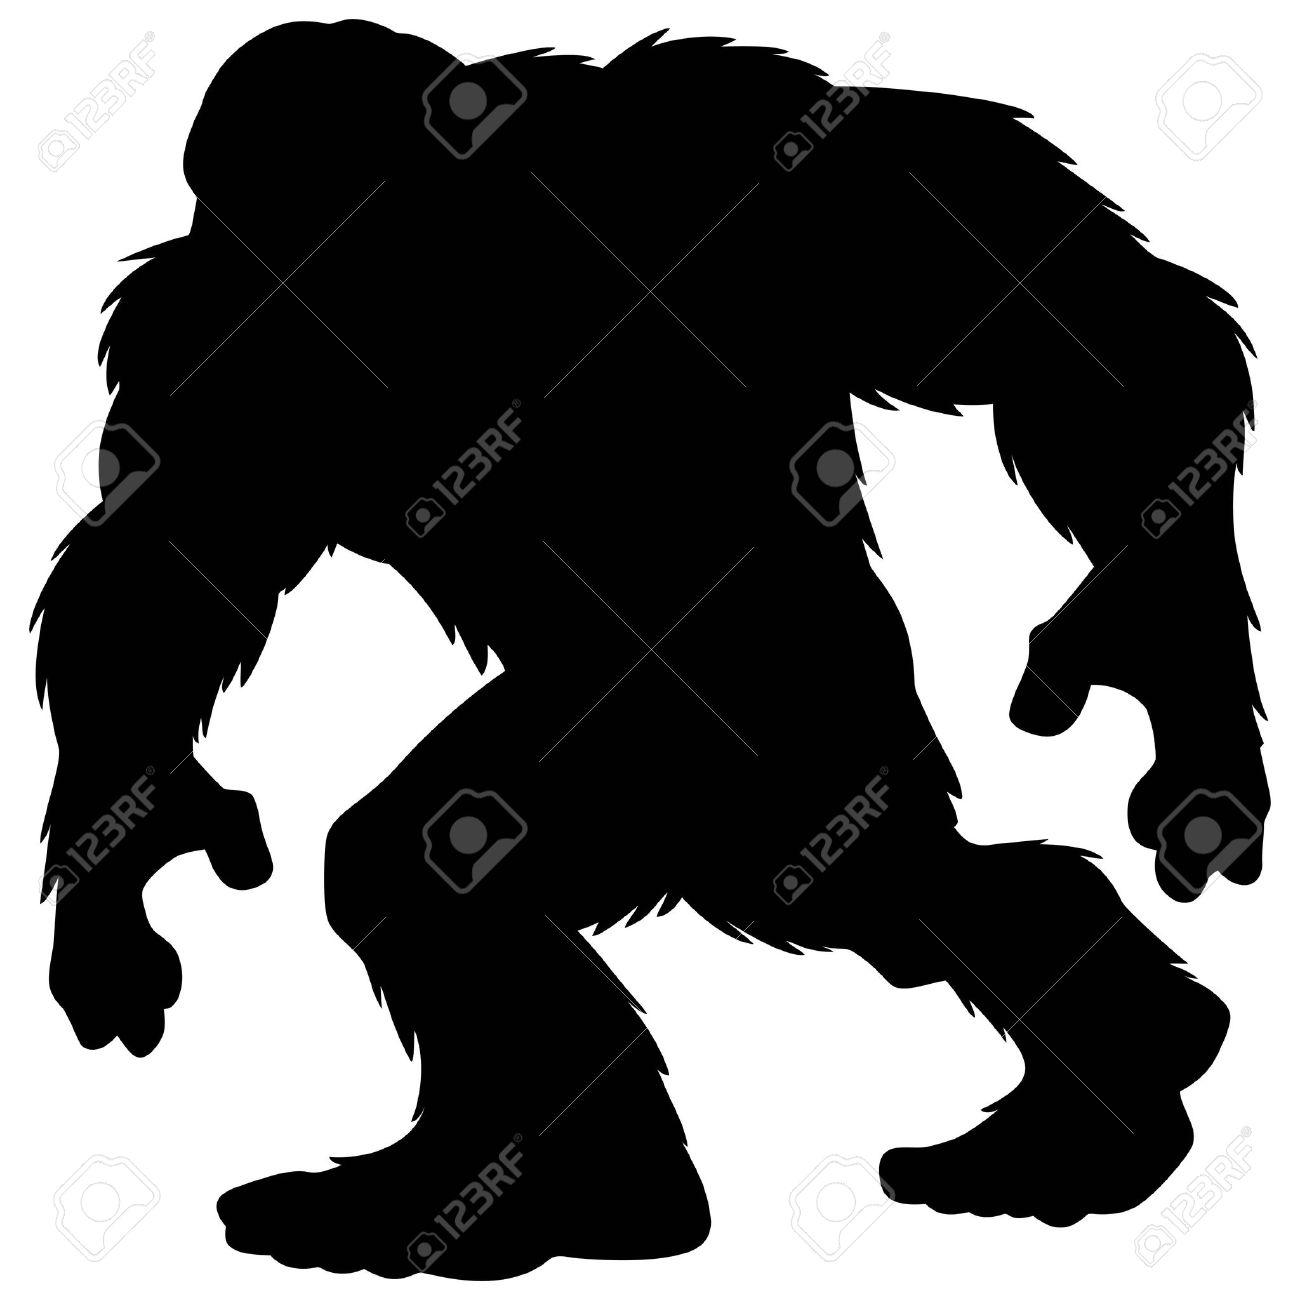 Bigfoot Mascot Silhouette.